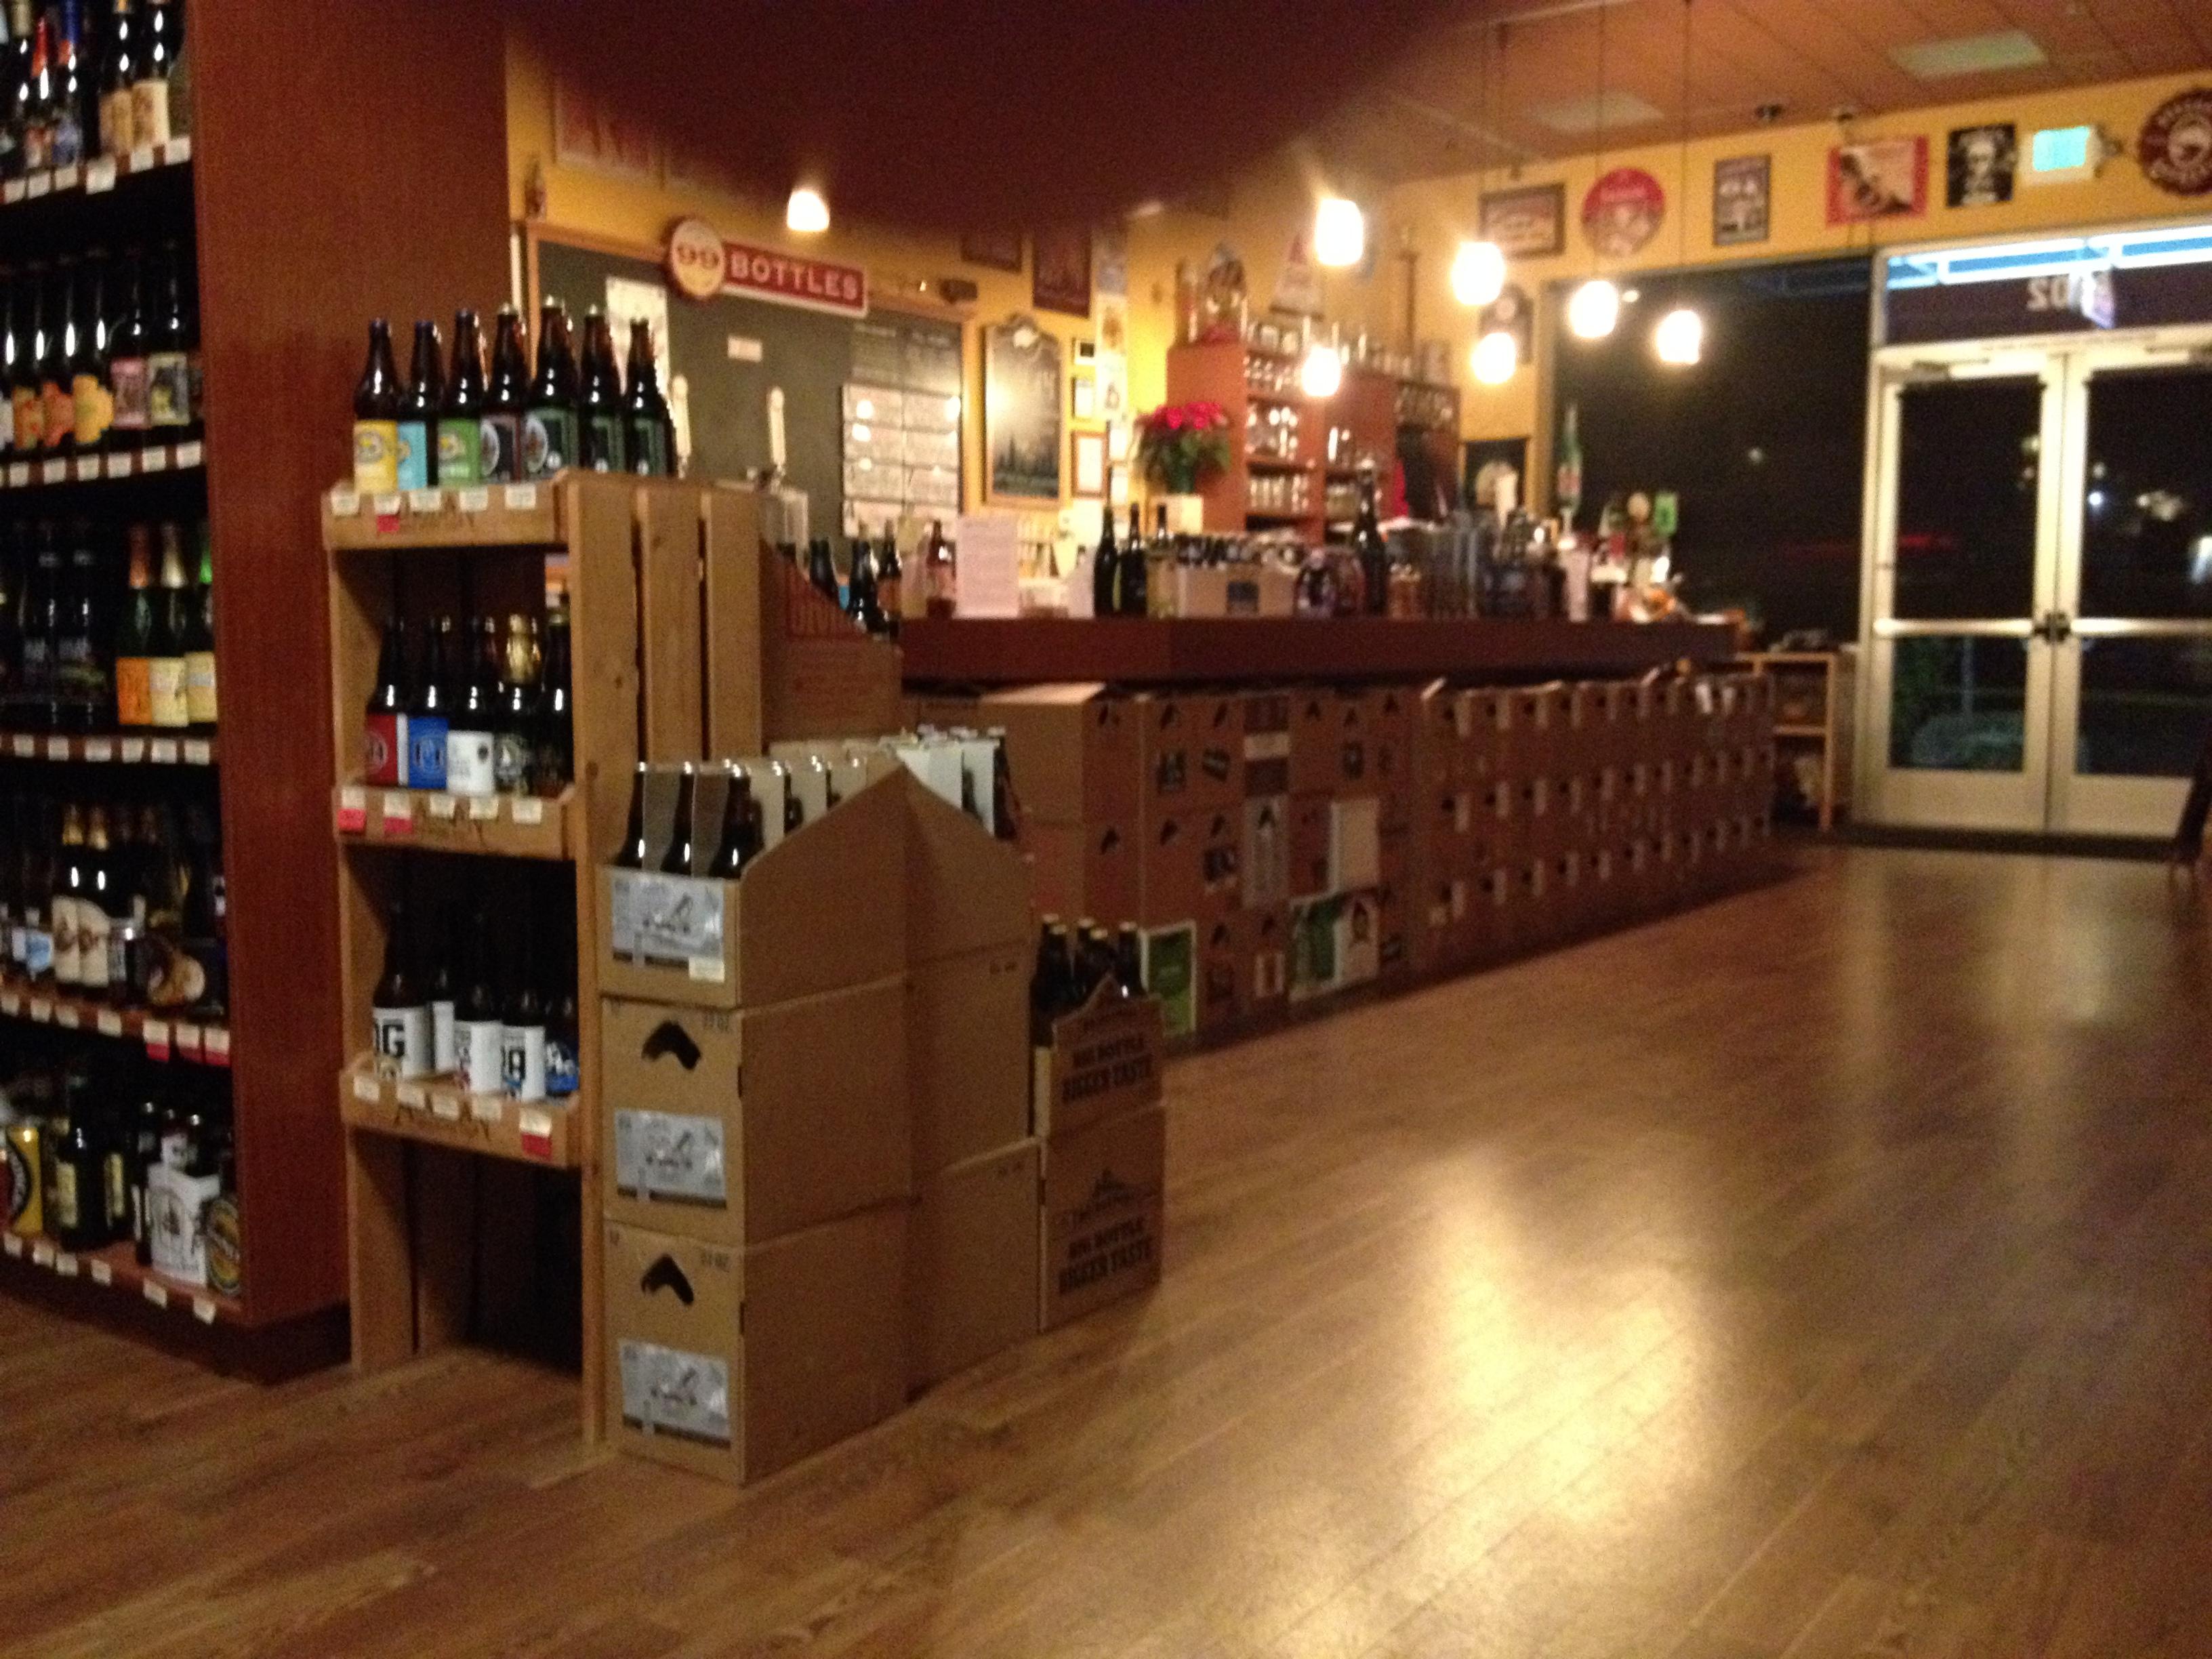 Beer store regulars